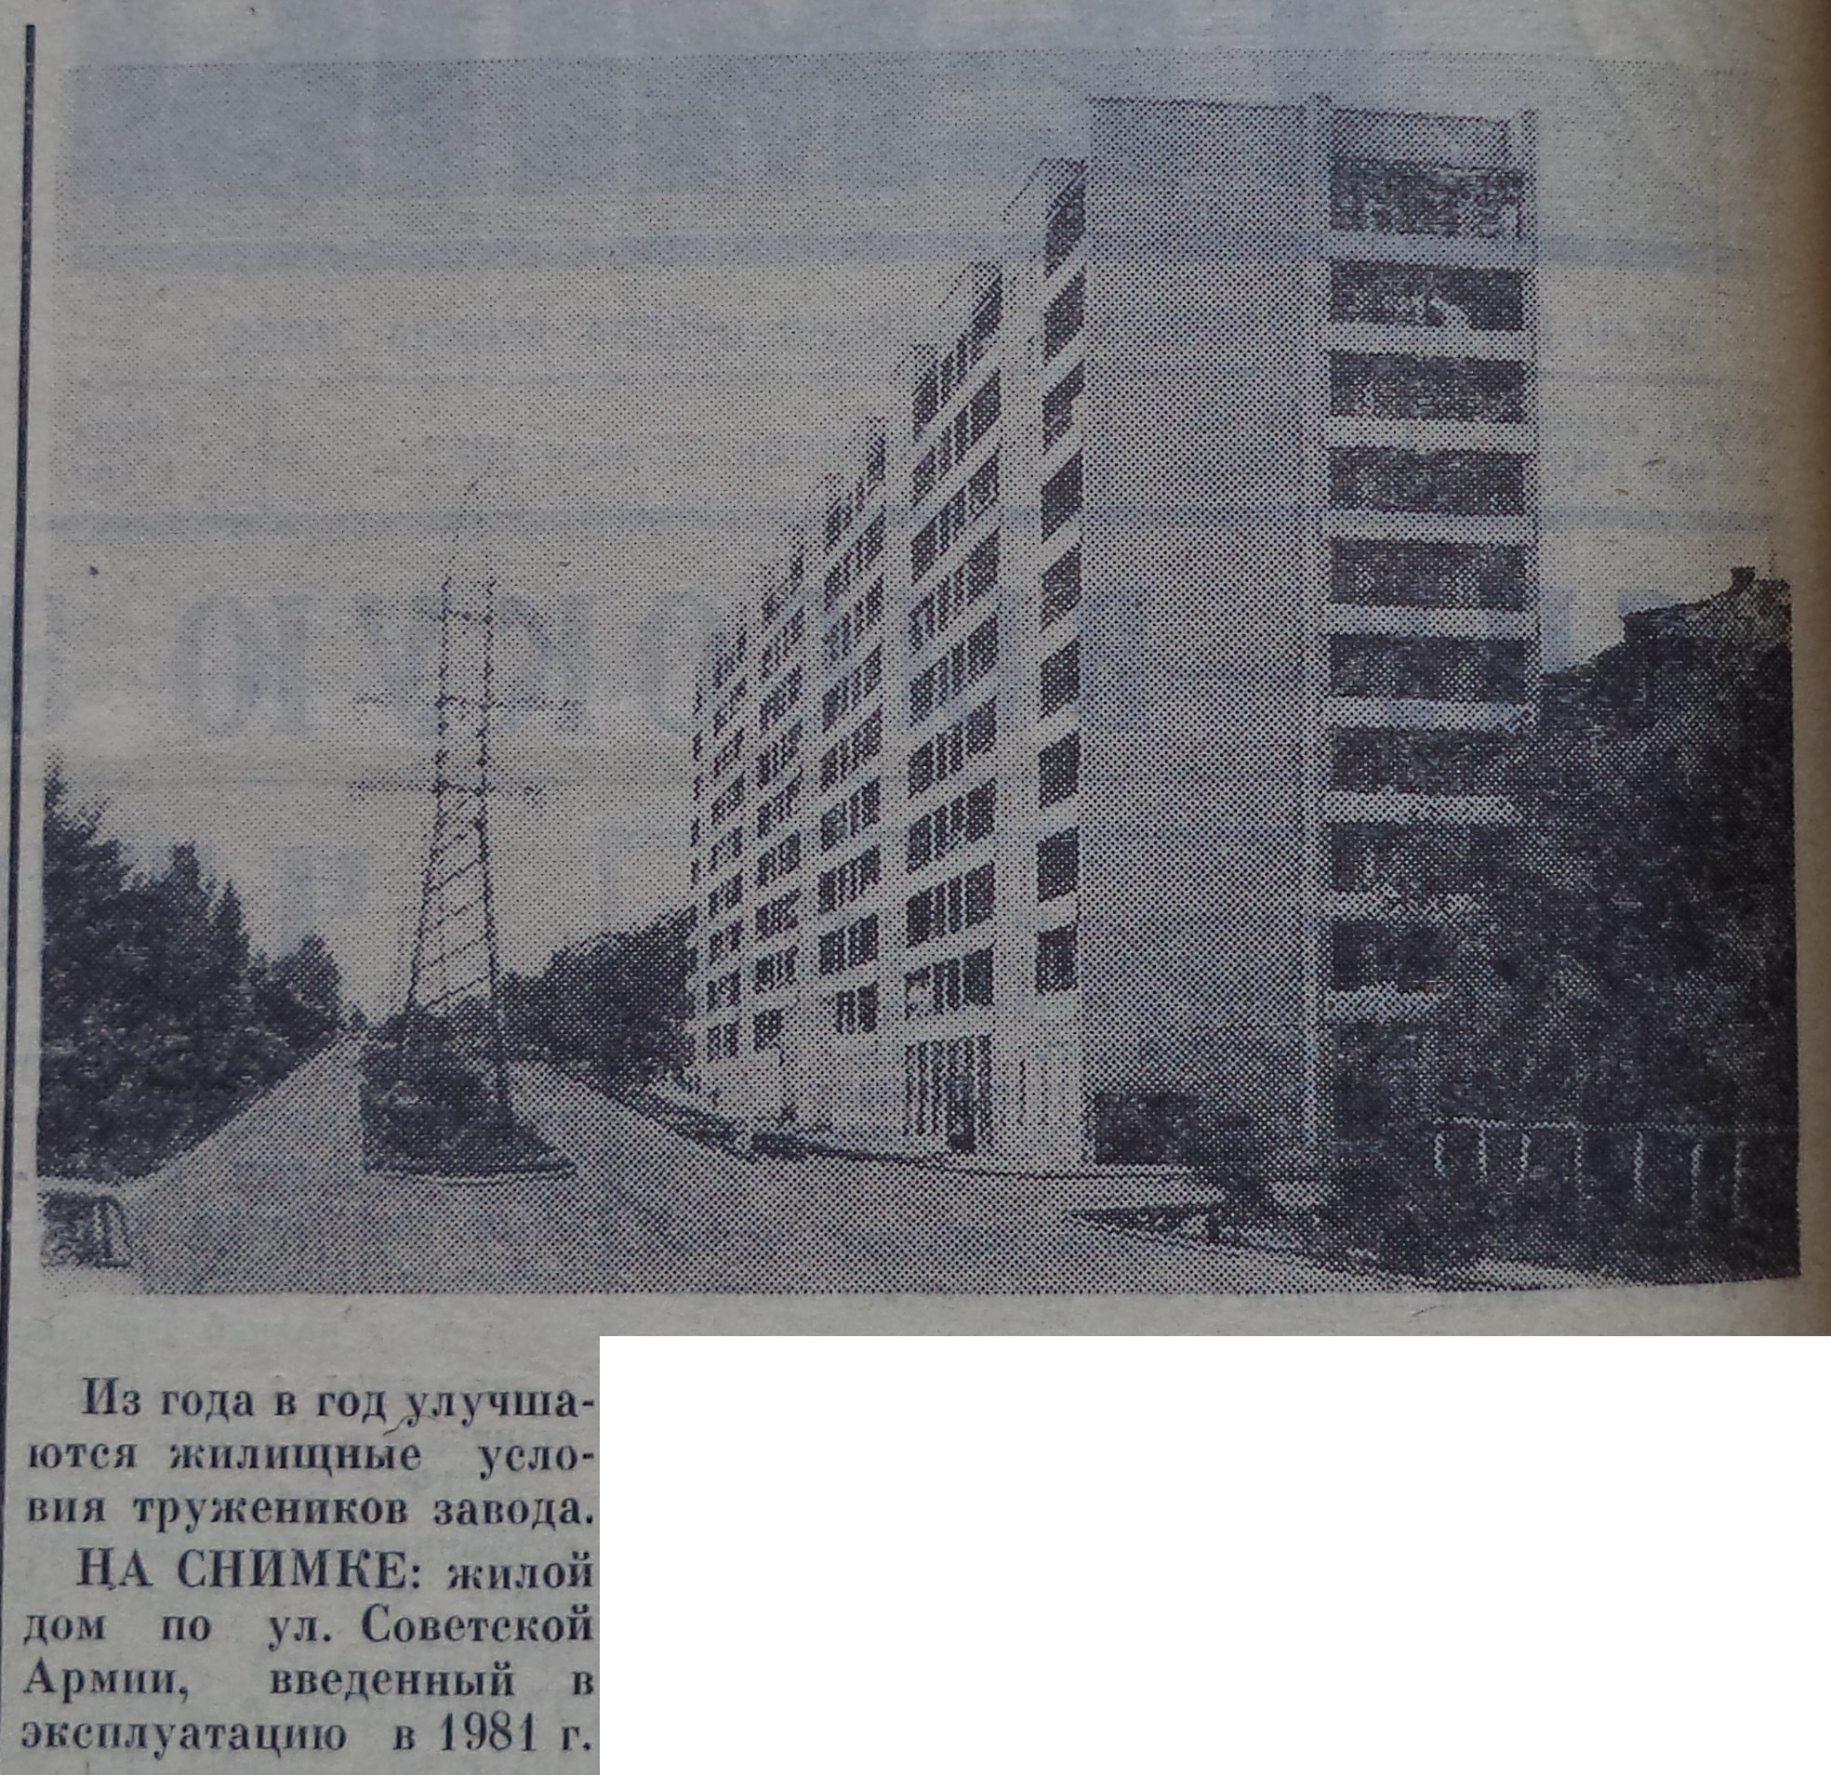 СА-ФОТО-049-За боевые темпы-1982-25 мая-2-min